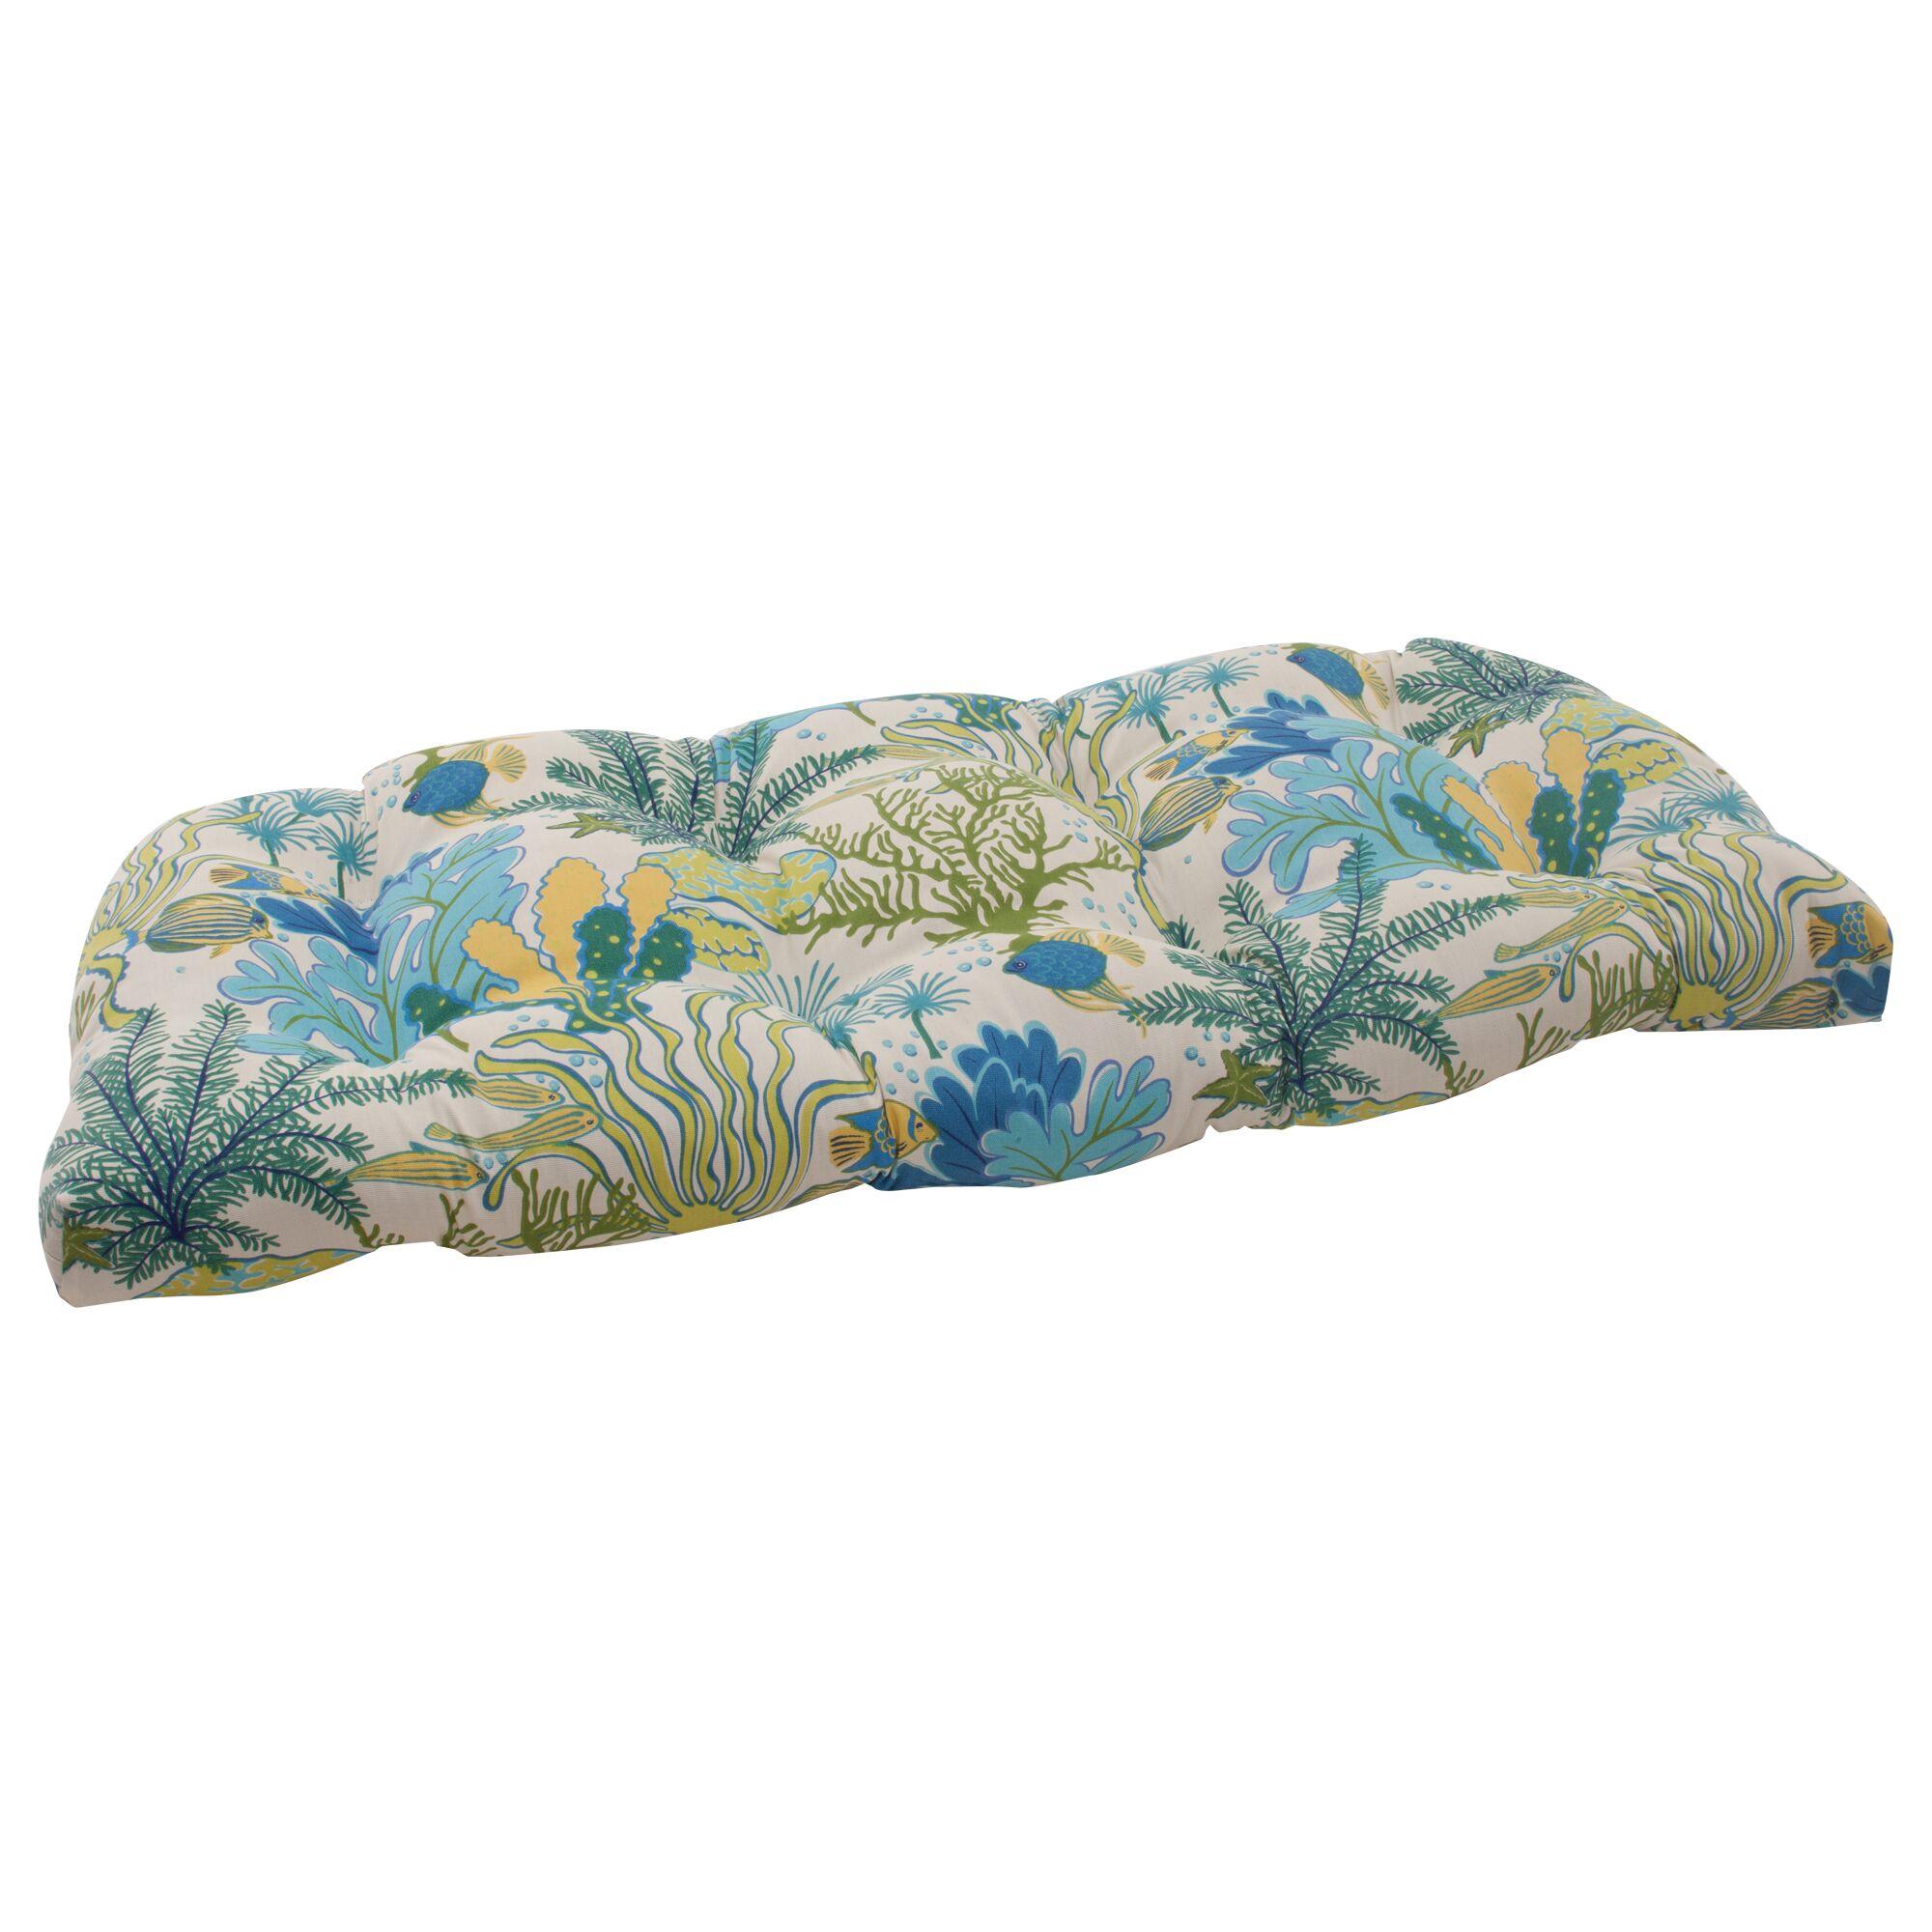 Splish Splash Indoor/Outdoor Loveseat Cushion Color: Cream / Green / Blue / Turquoise